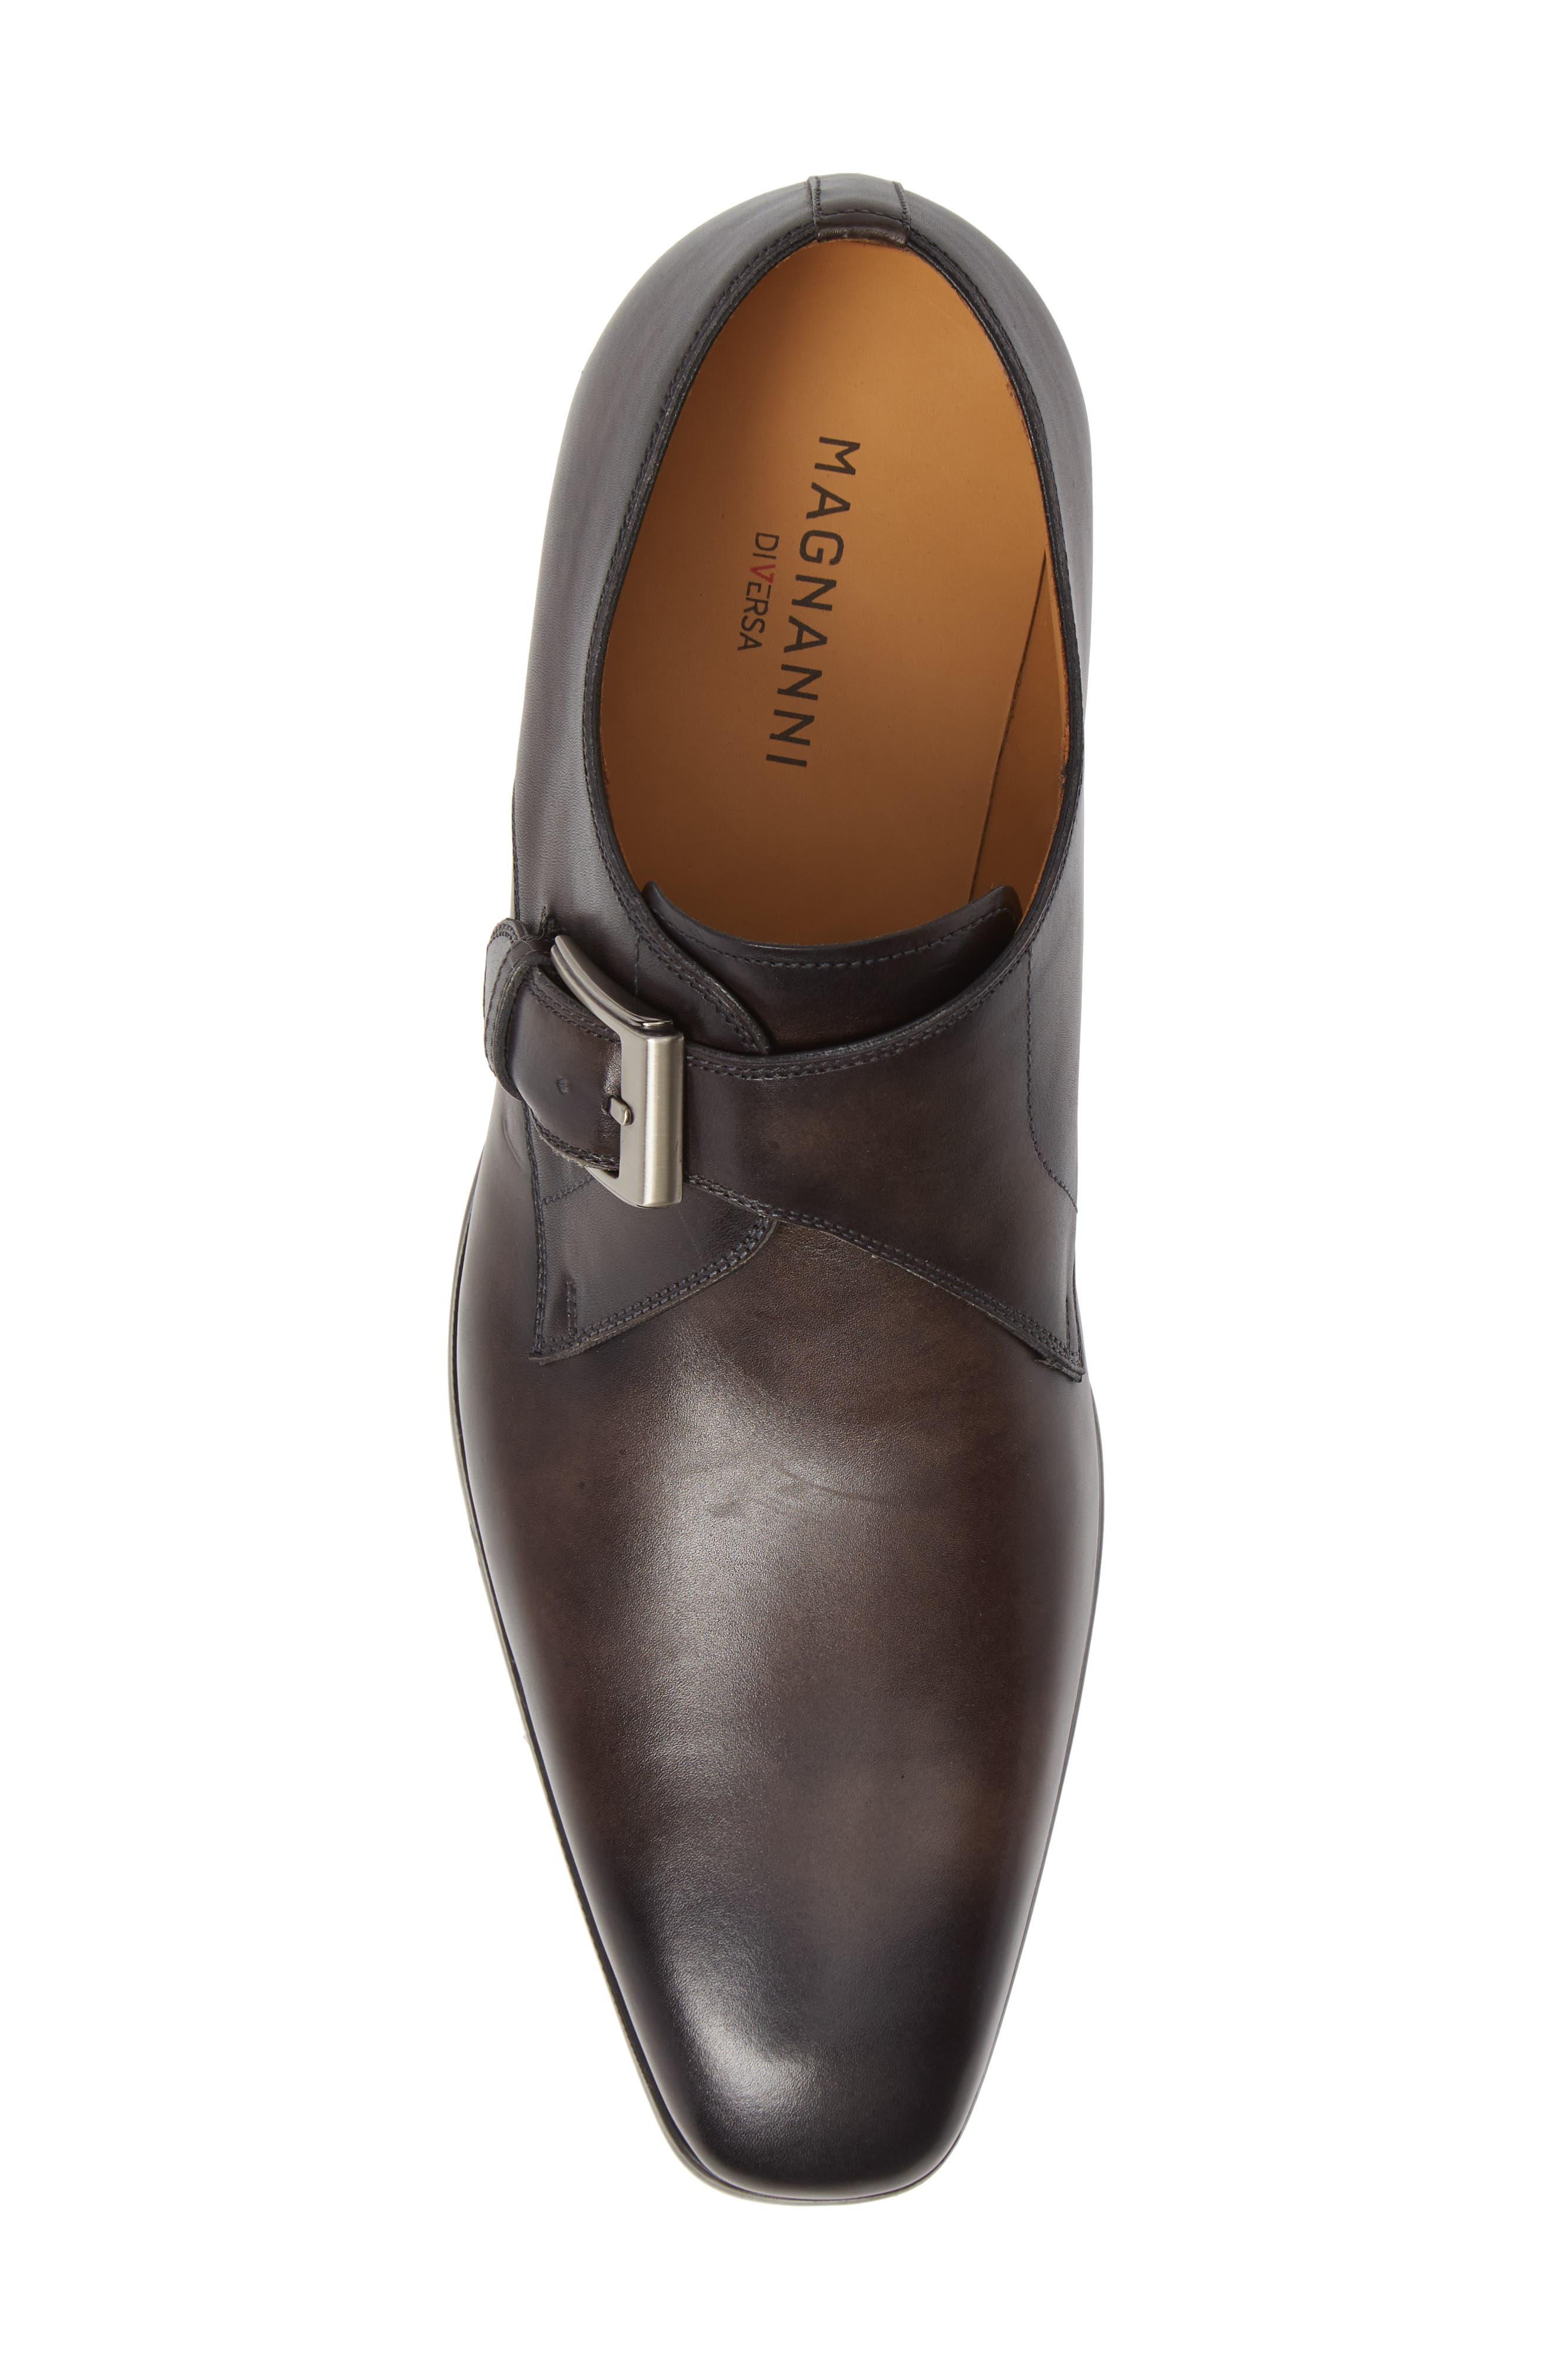 MAGNANNI, Roddy Diversa Plain Toe Monk Strap Shoe, Alternate thumbnail 5, color, GREY LEATHER